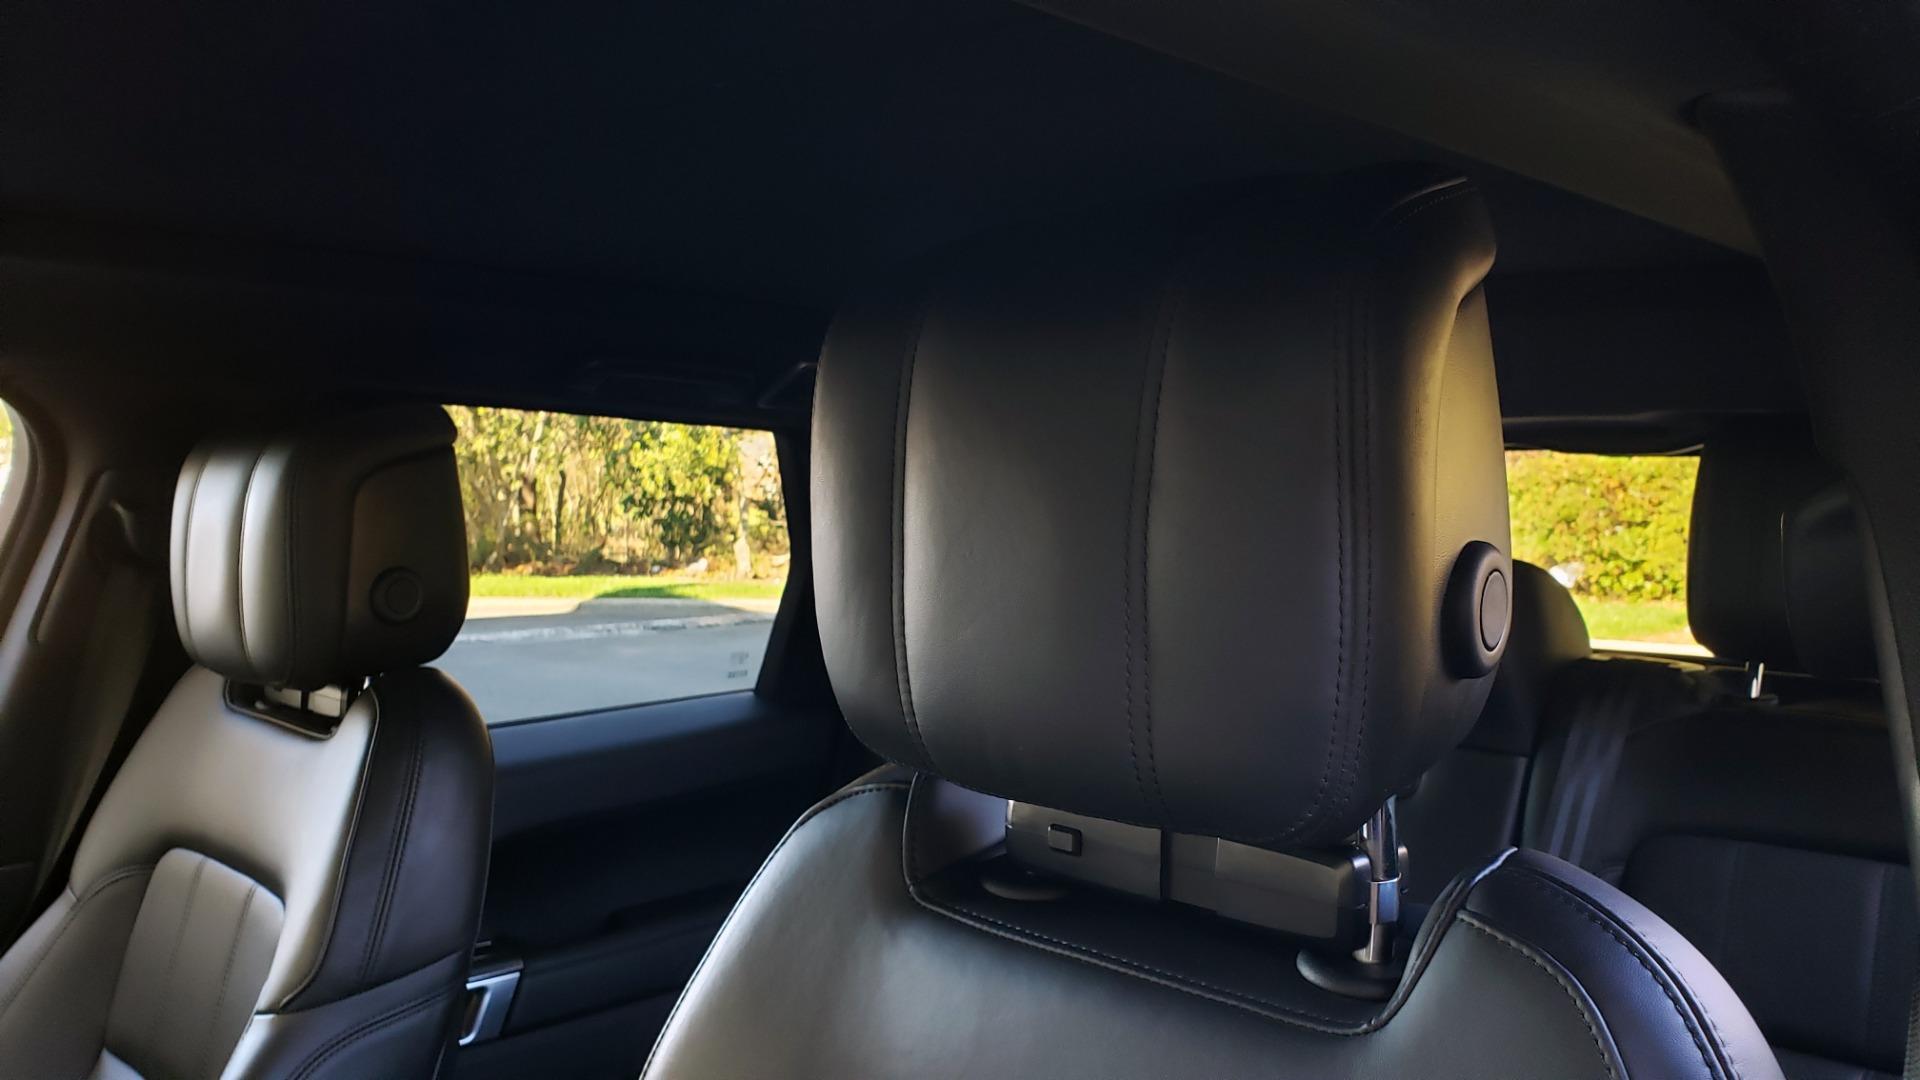 Used 2018 Land Rover RANGE ROVER SPORT DYNAMIC SC V8 / CLIMATE CMFRT / VISION ASST / MERIDIAN for sale Sold at Formula Imports in Charlotte NC 28227 49